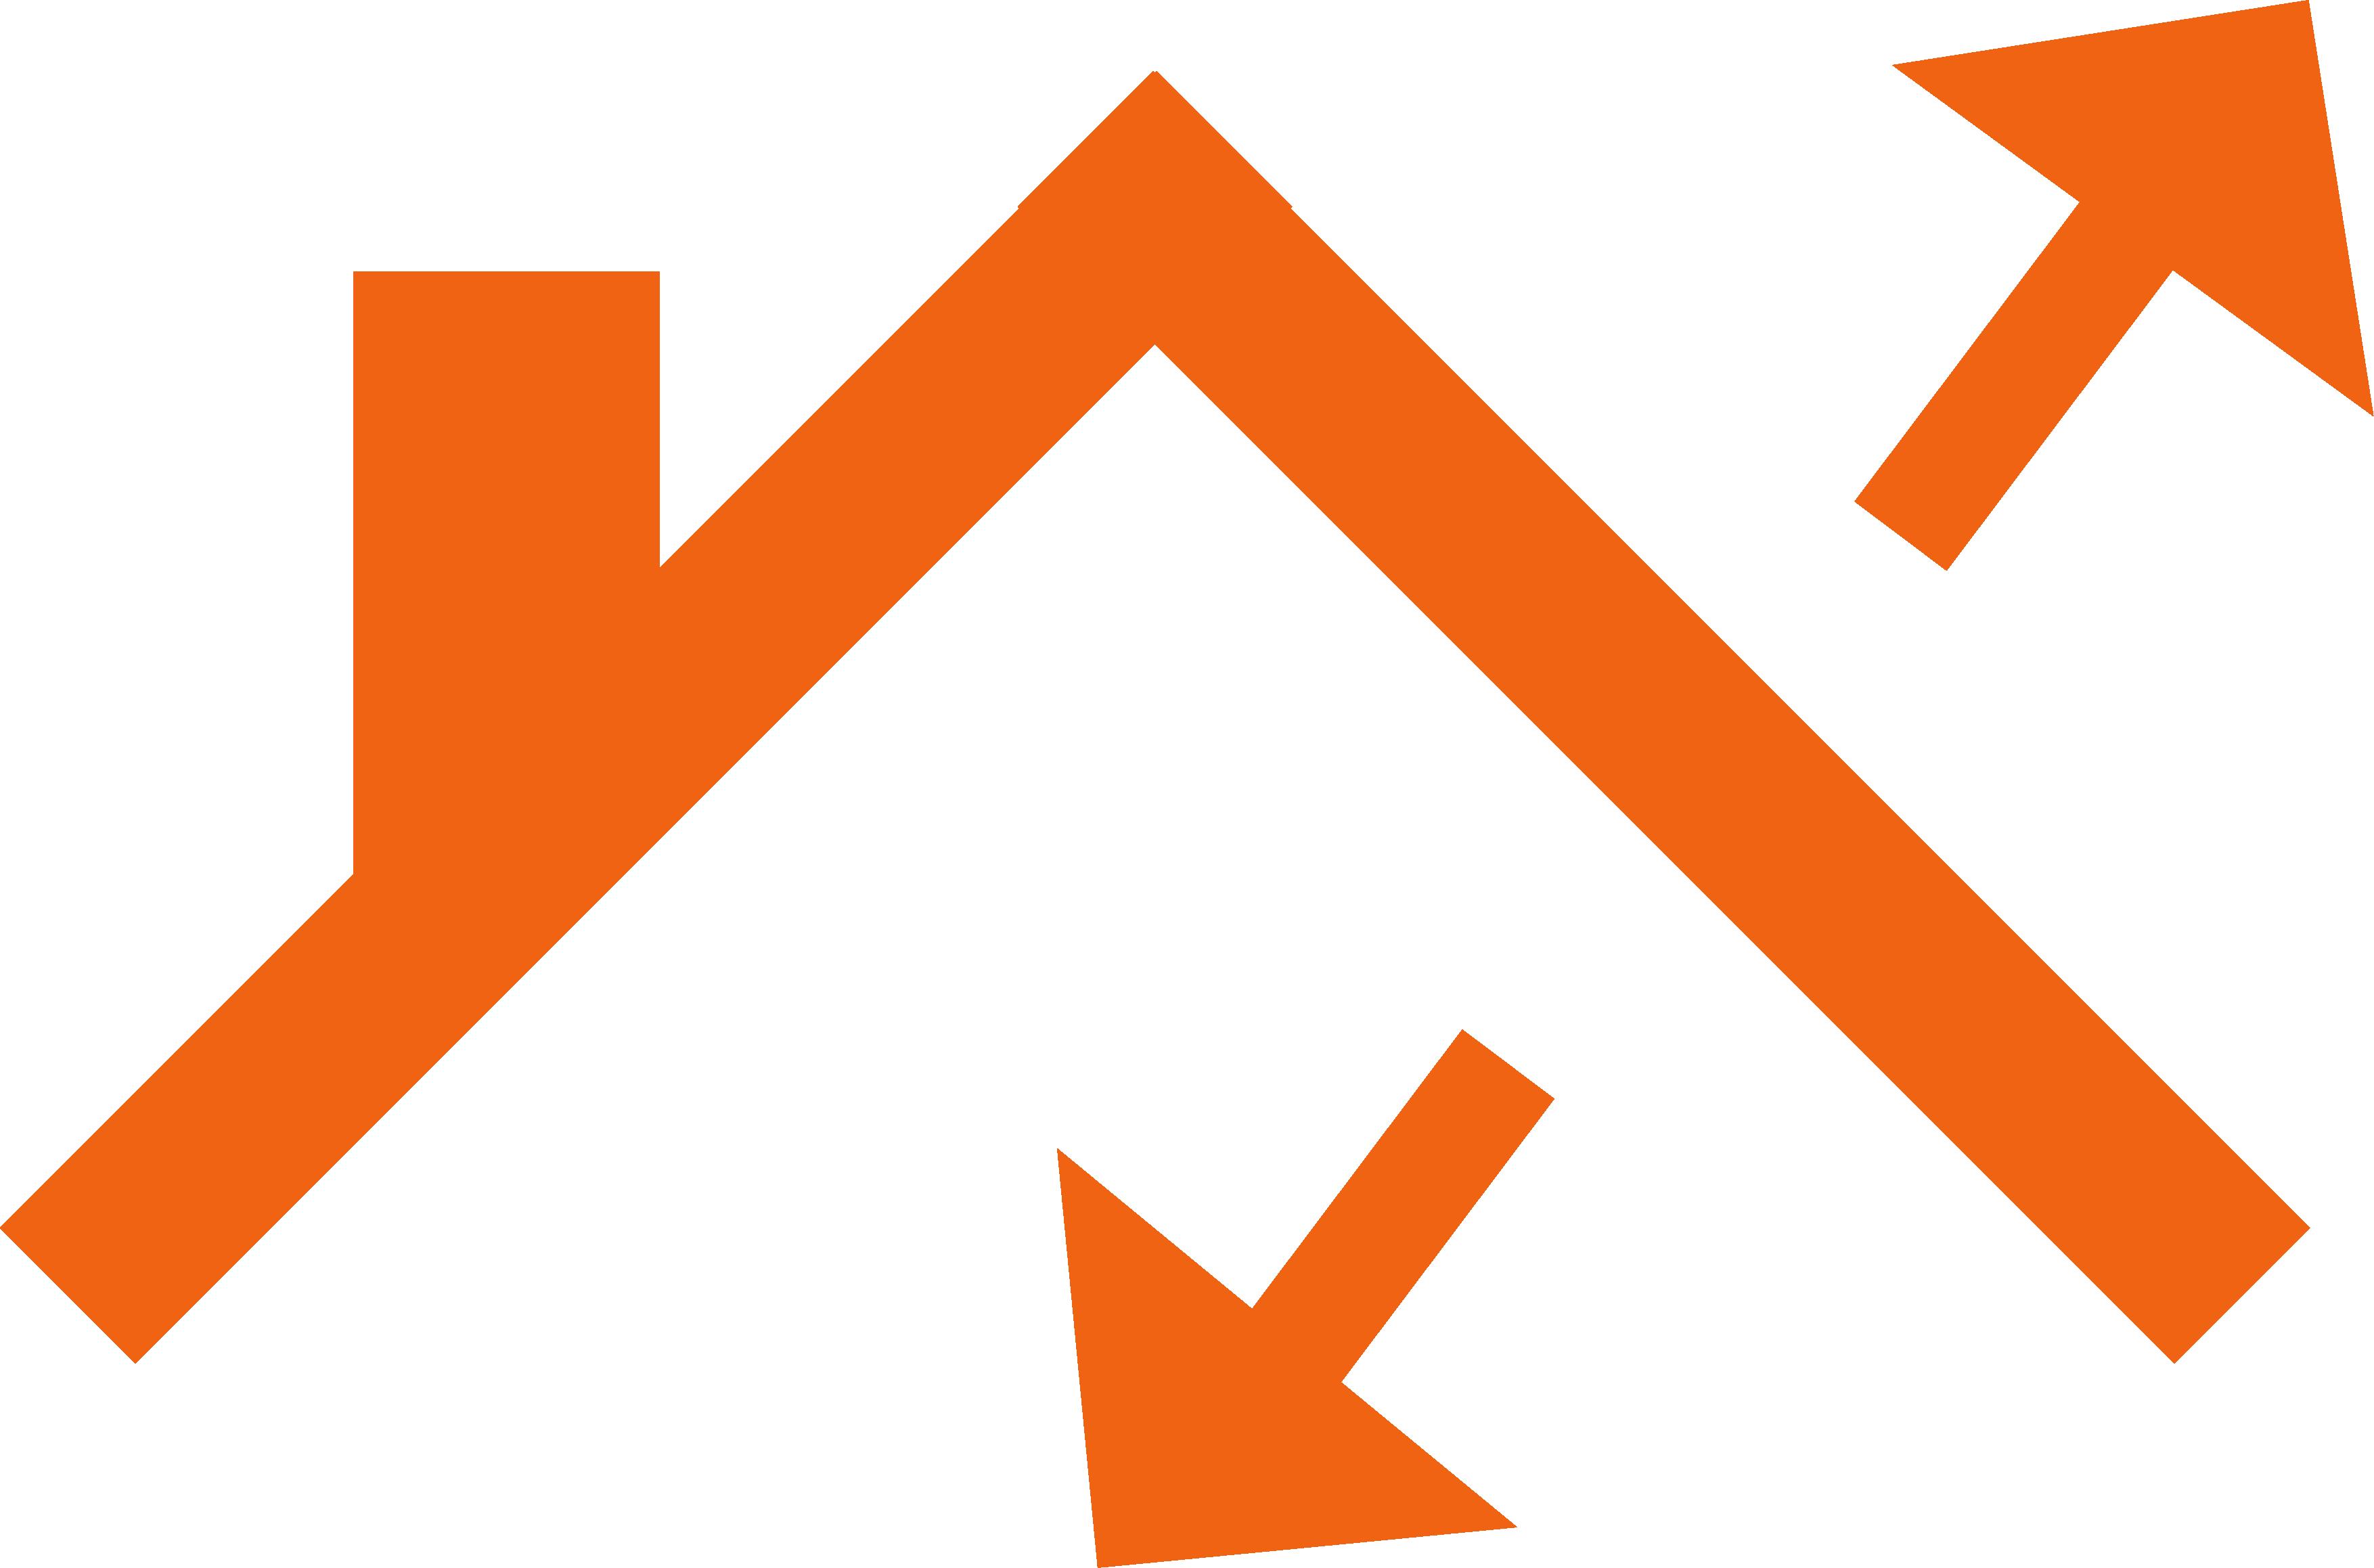 Isolation picto - Activités